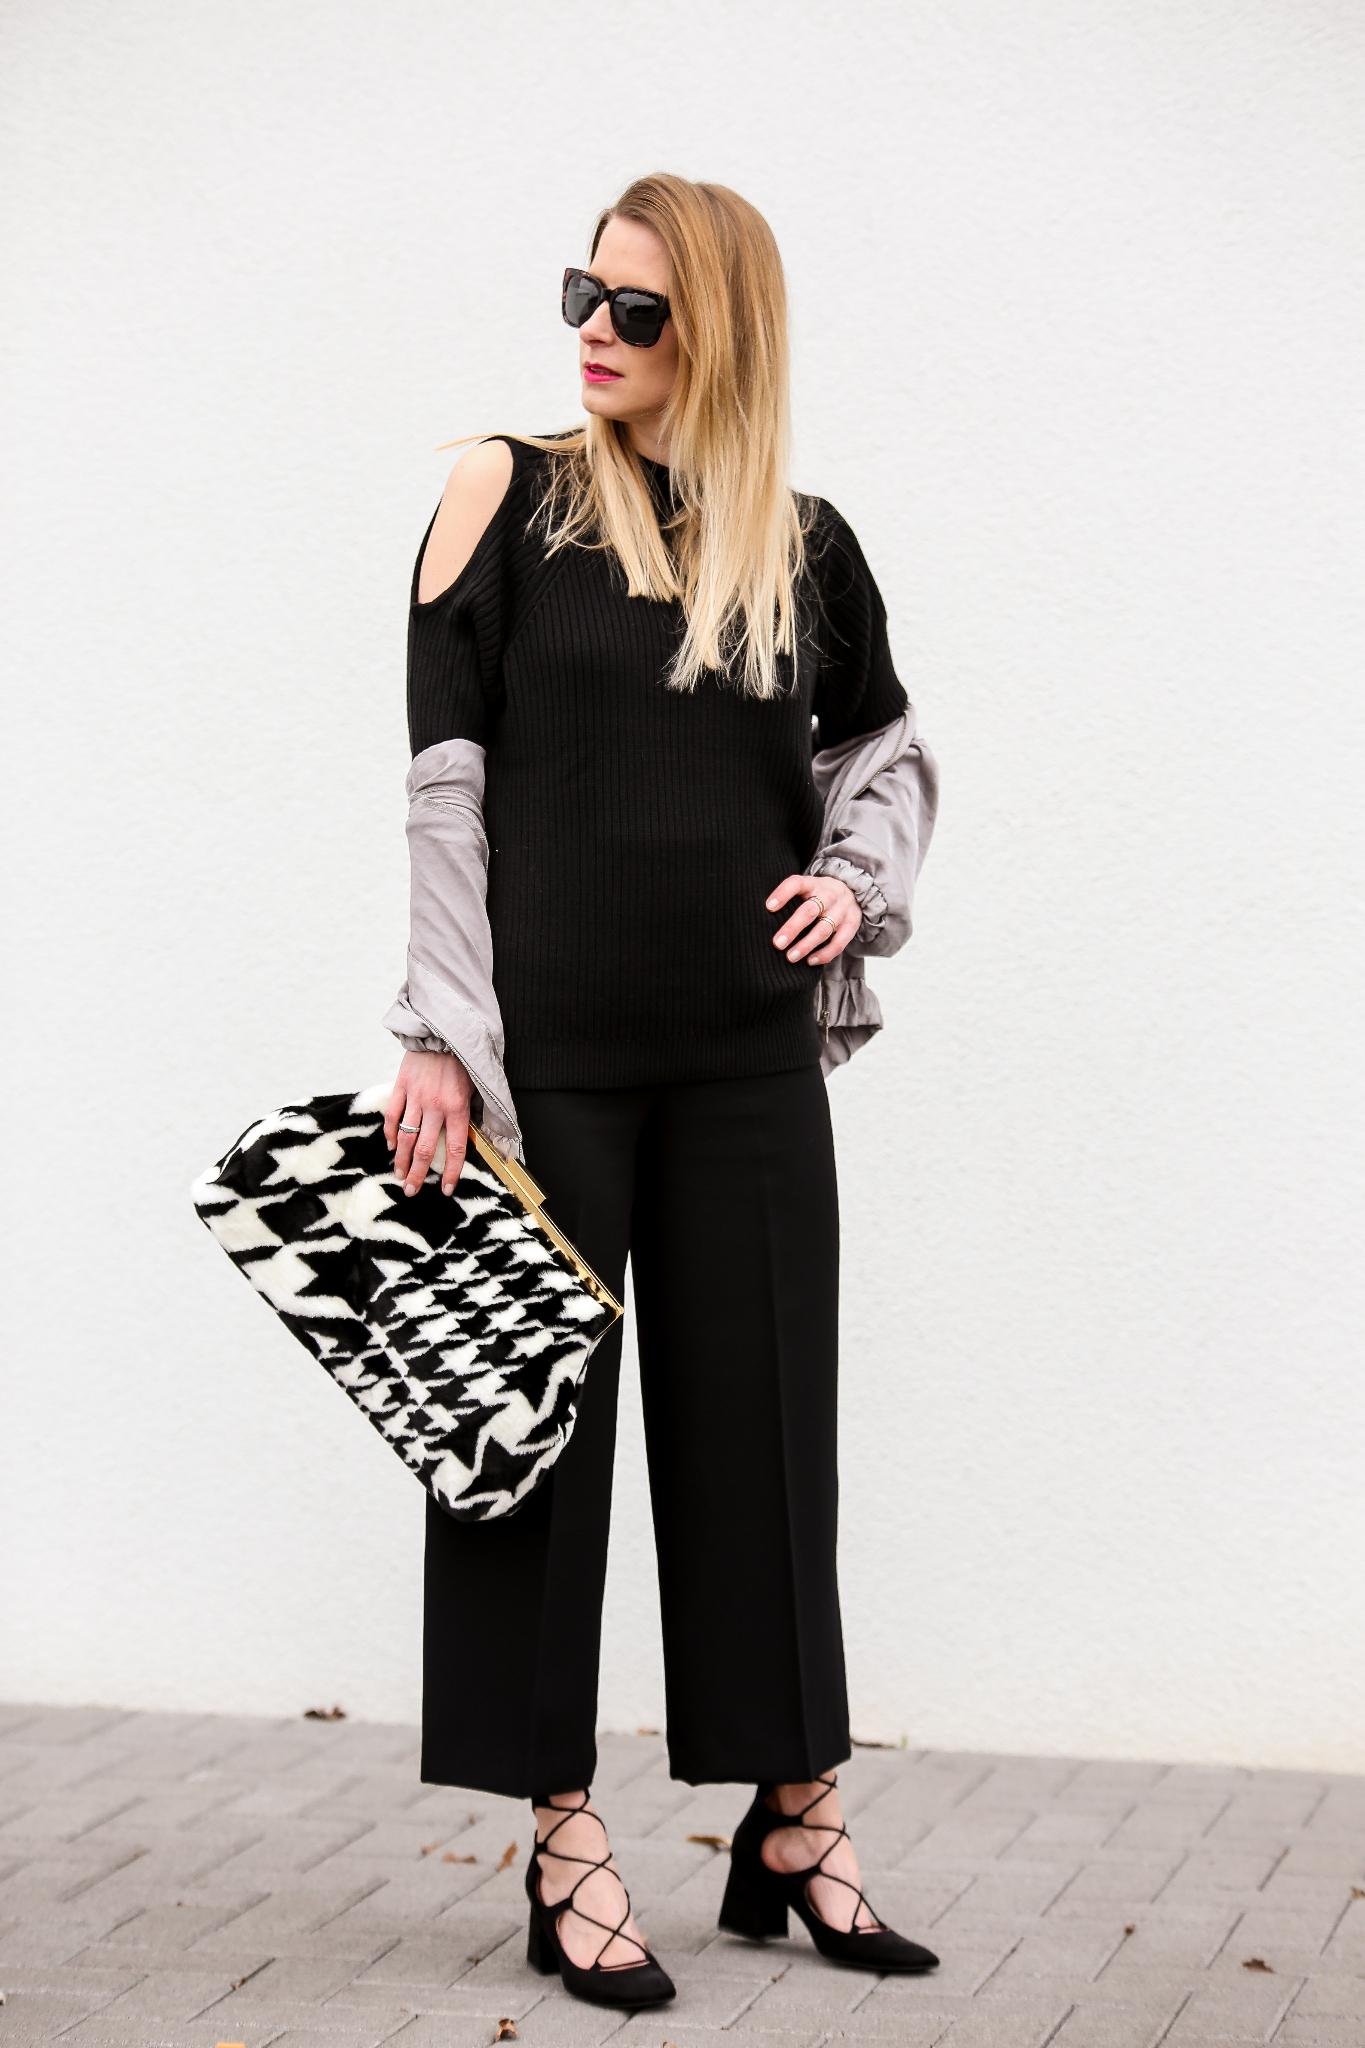 Fashion_Outfit_Satin_Bomber_Cold_Shoulder_MOD - by Monique-6